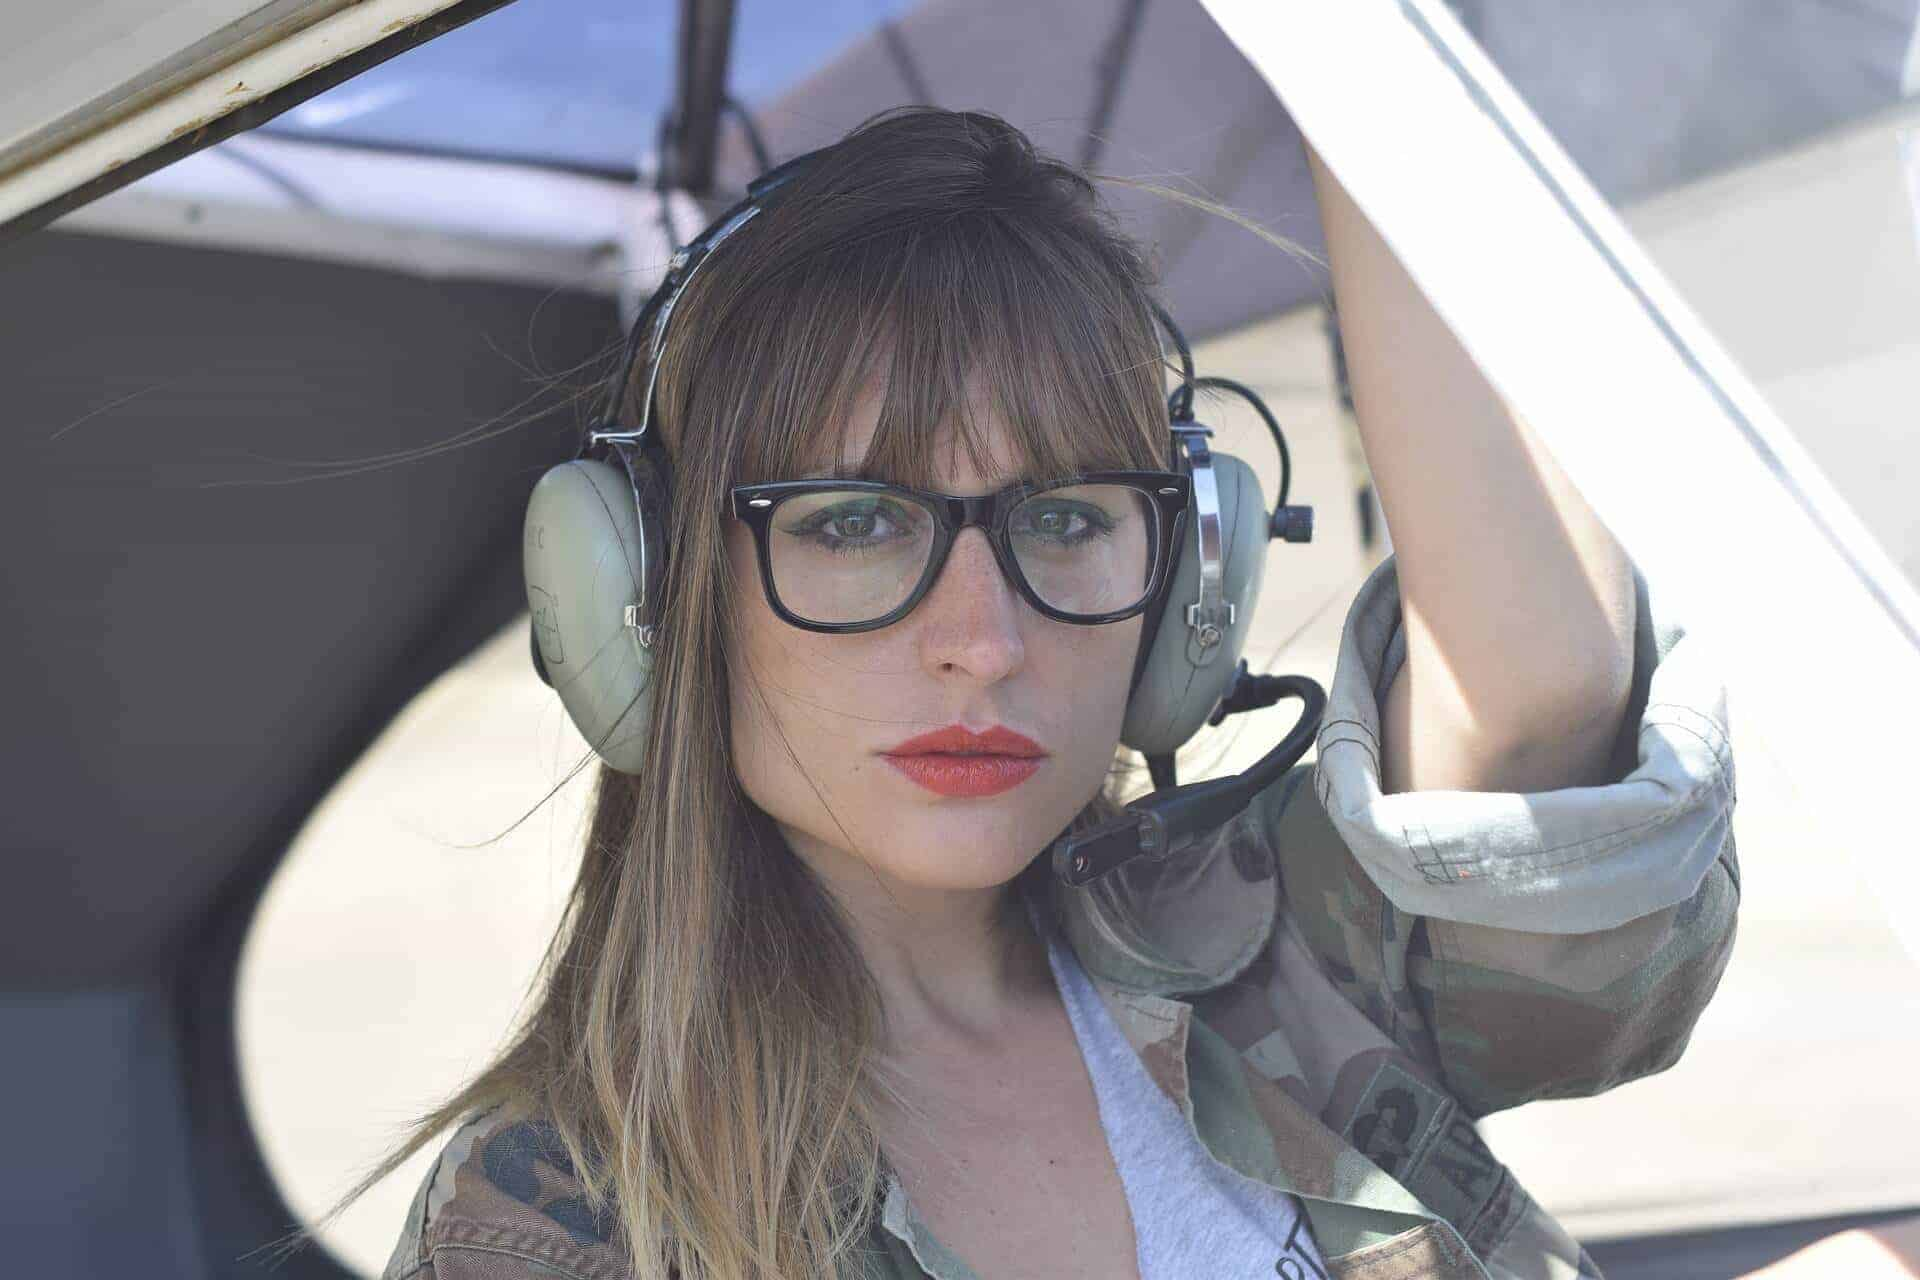 Pilotin mit Kopfhörer in Flugzeug